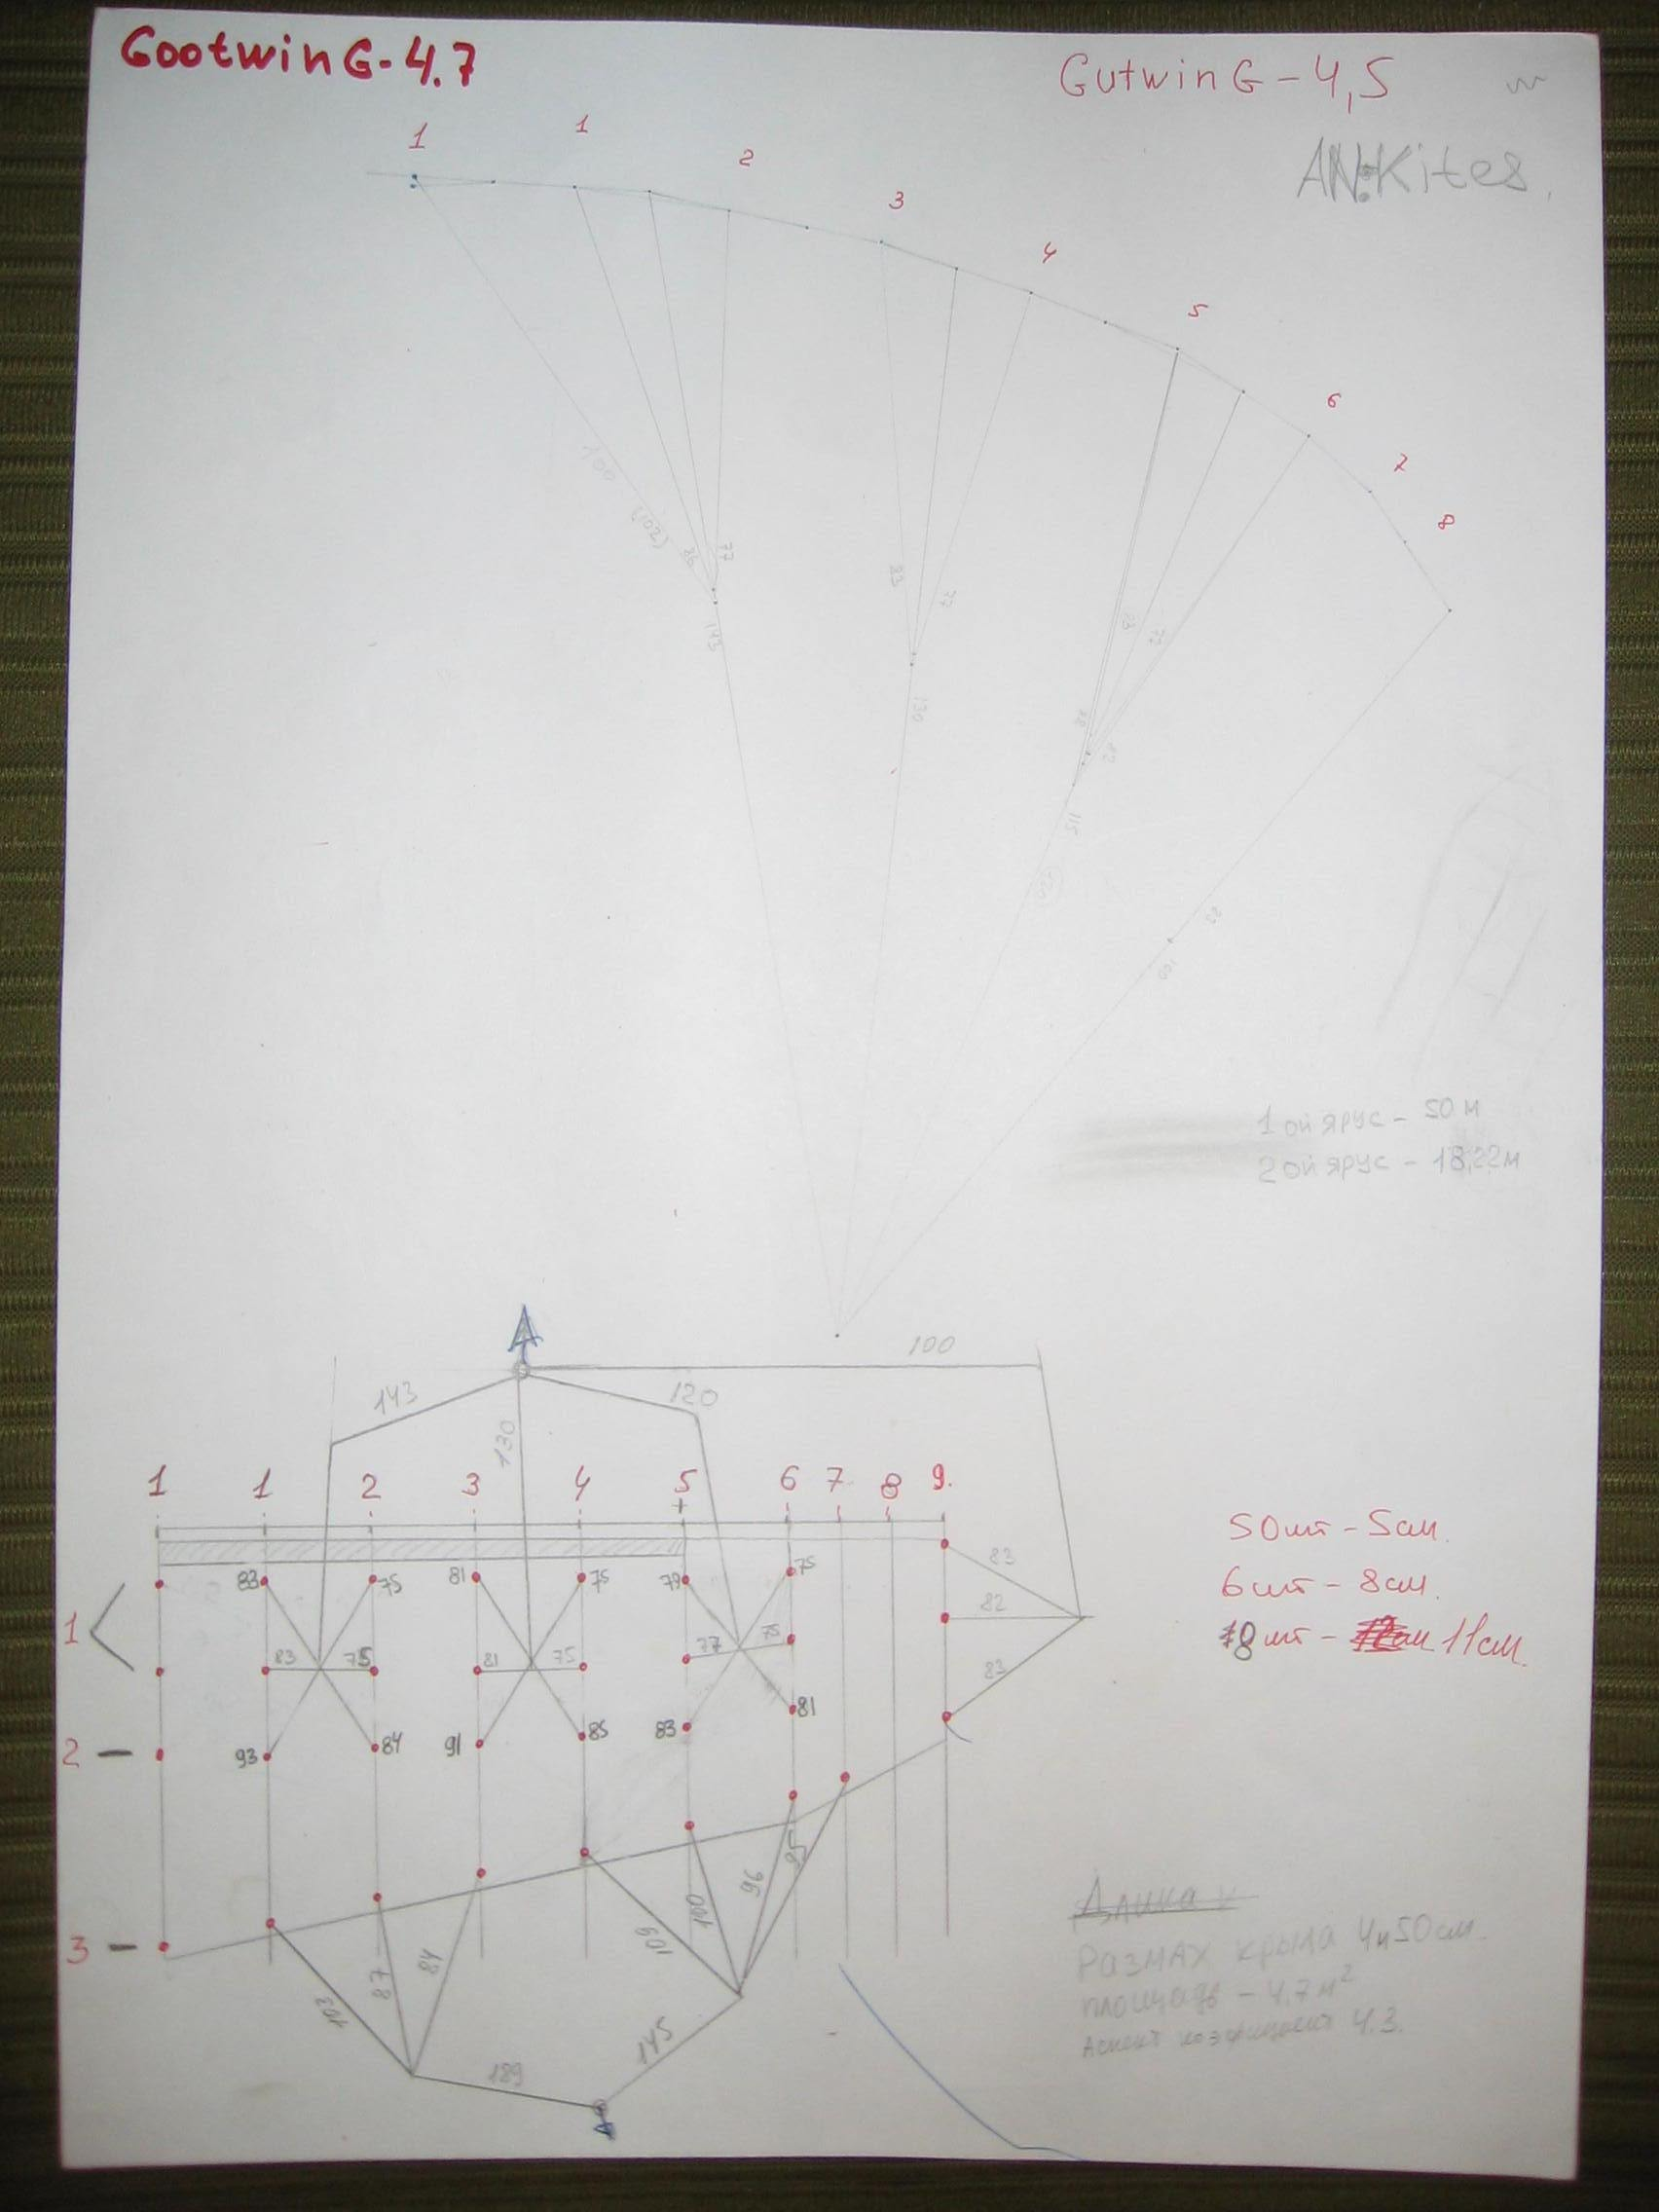 http://kite-skate.narod.ru/goodwing/2goodwing.JPG